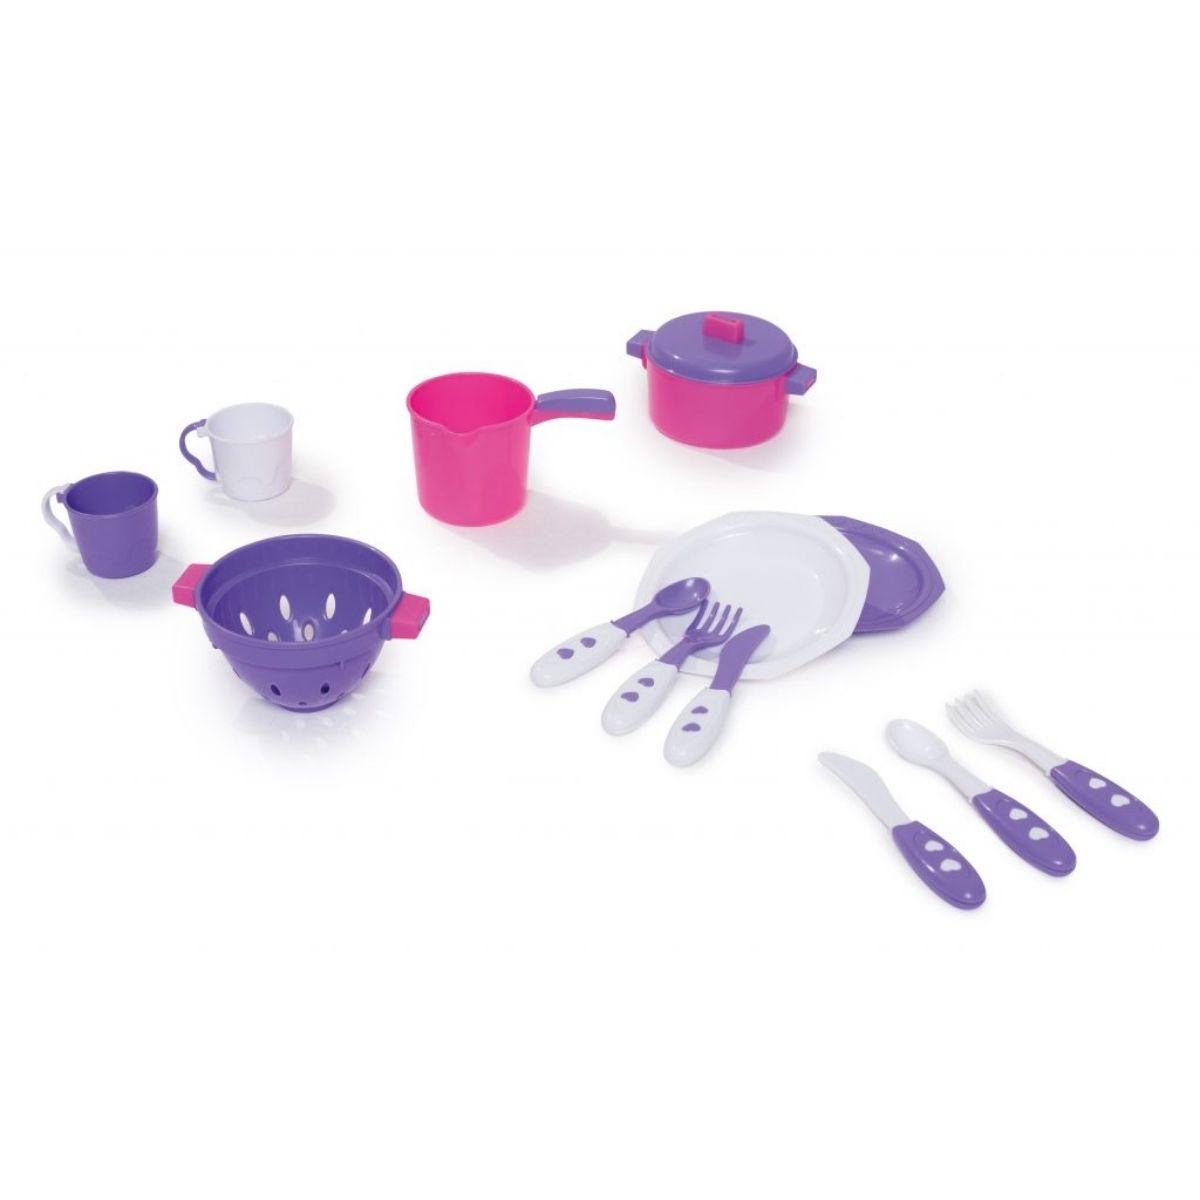 Kit de Cozinha Rosa Calesita